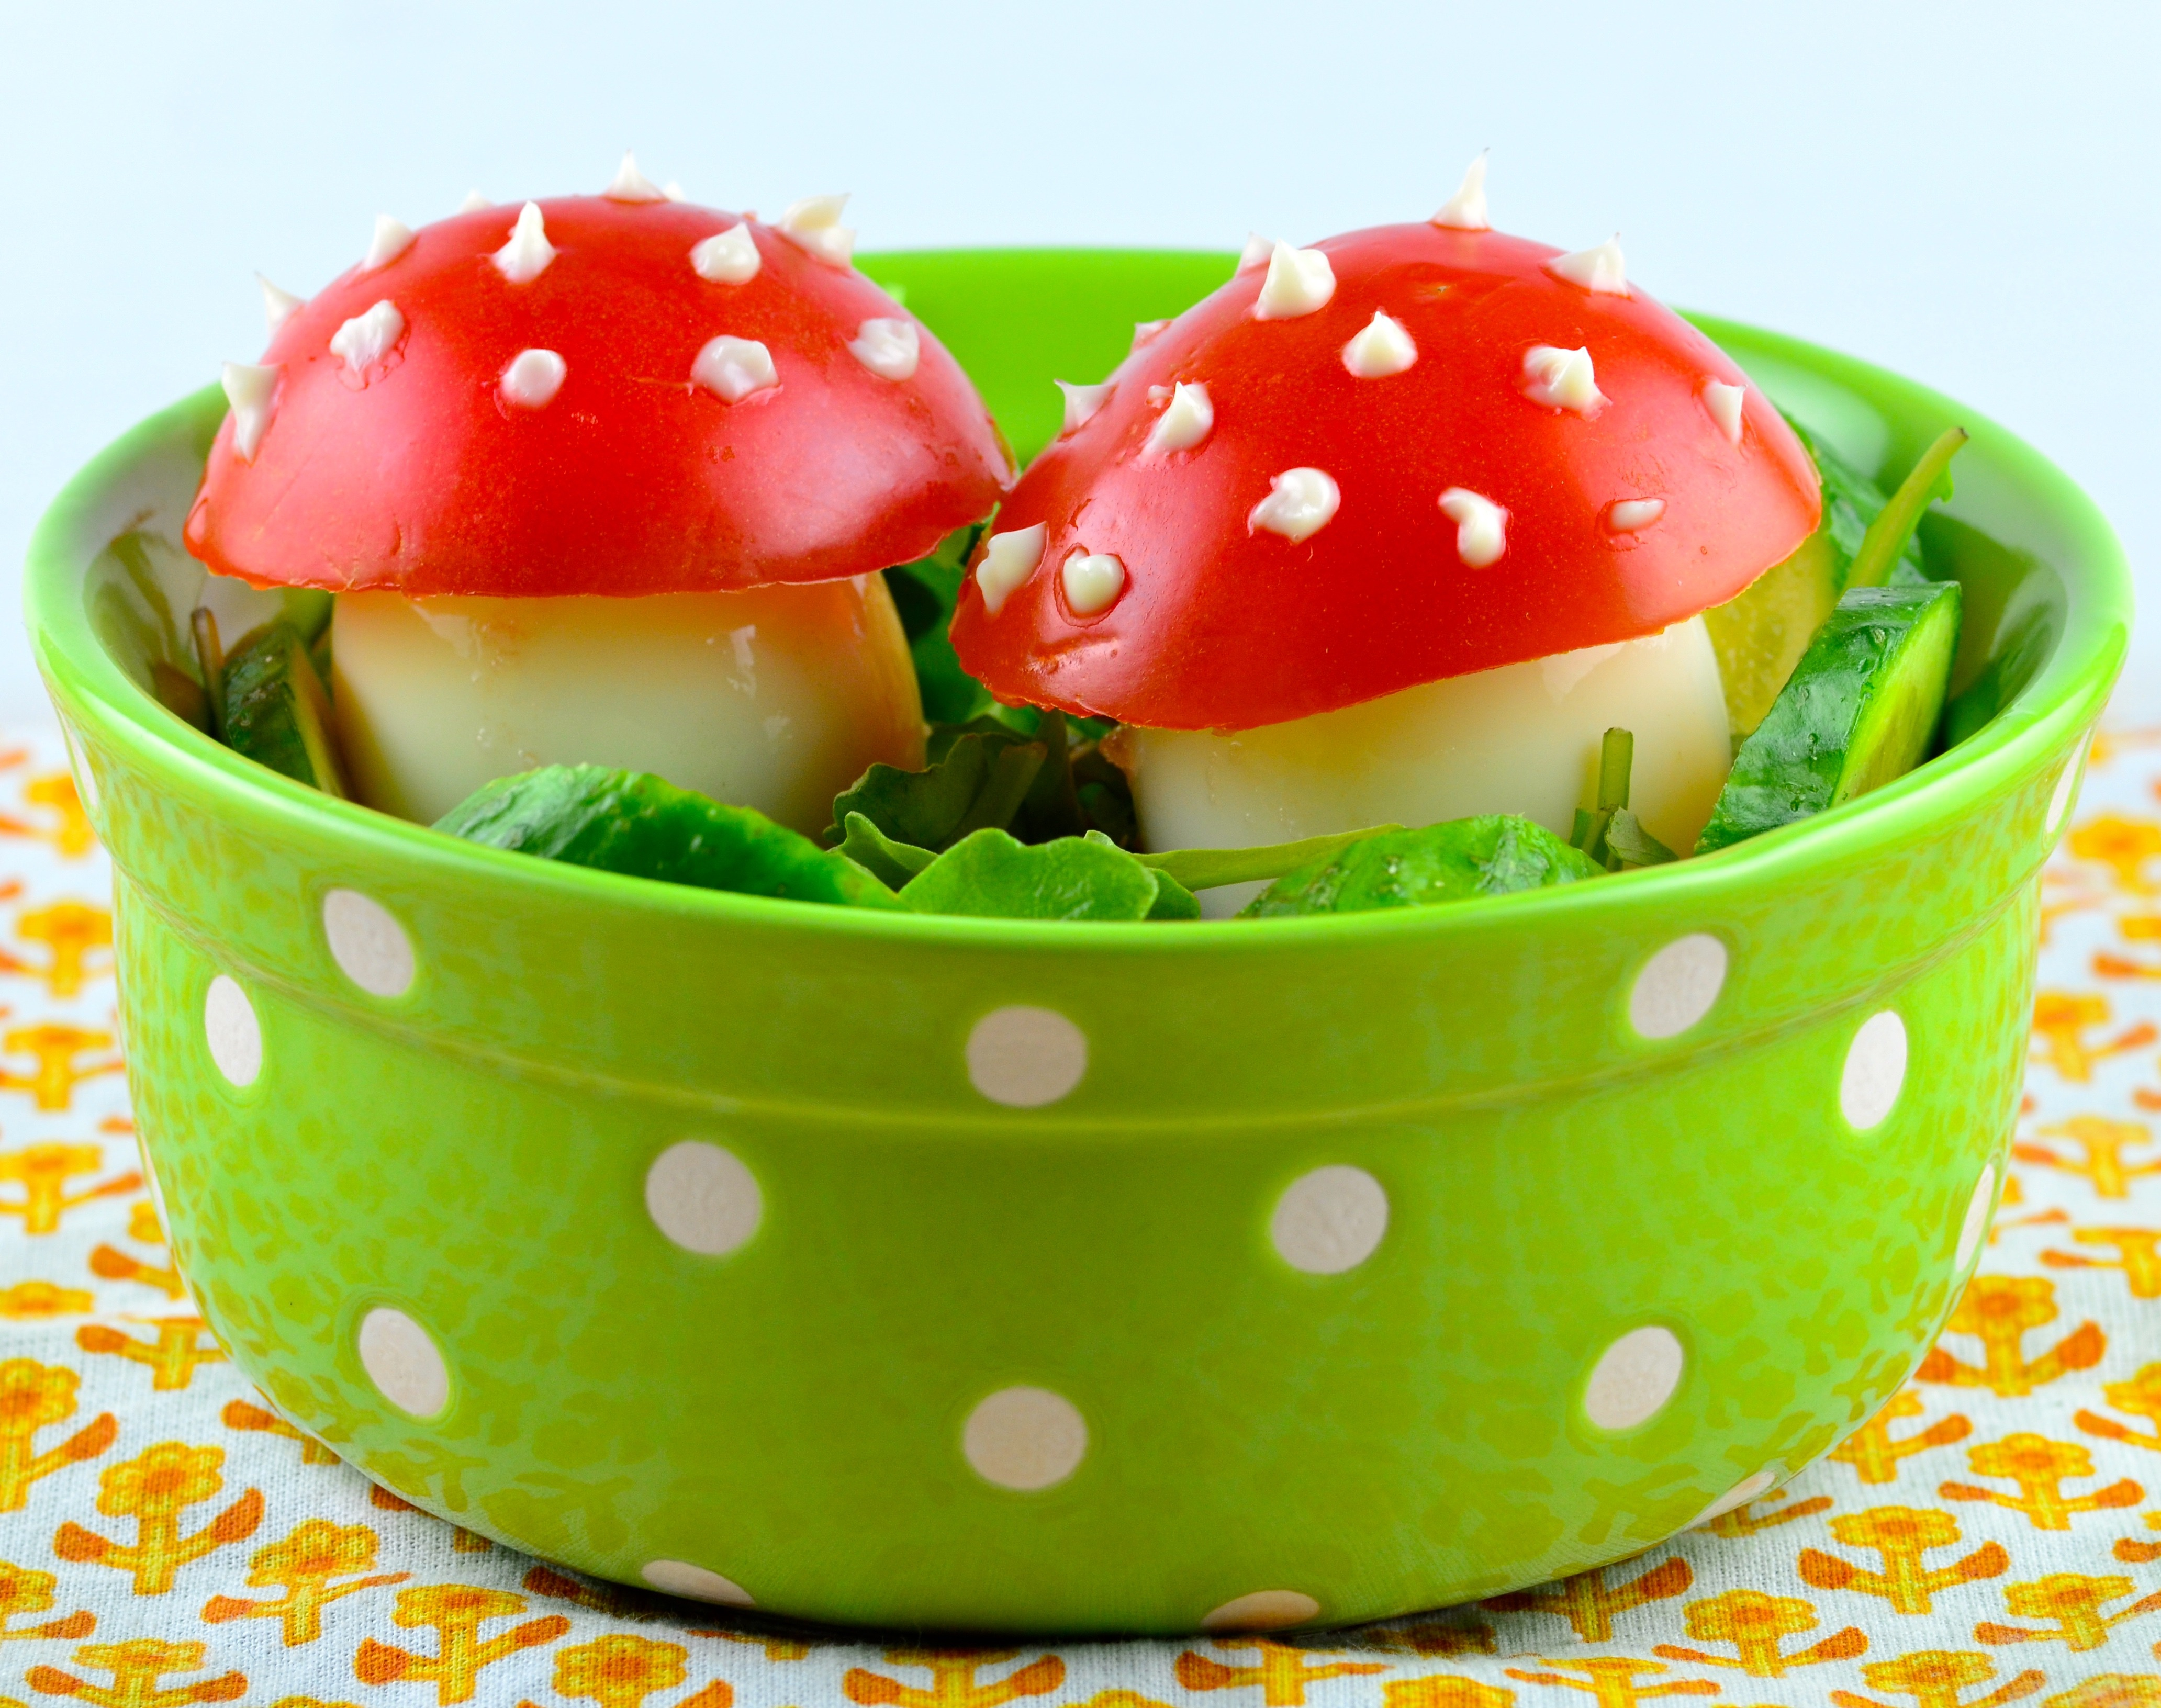 Marvelous Food Craft Ideas For Kids Part - 14: Genius Kitchen